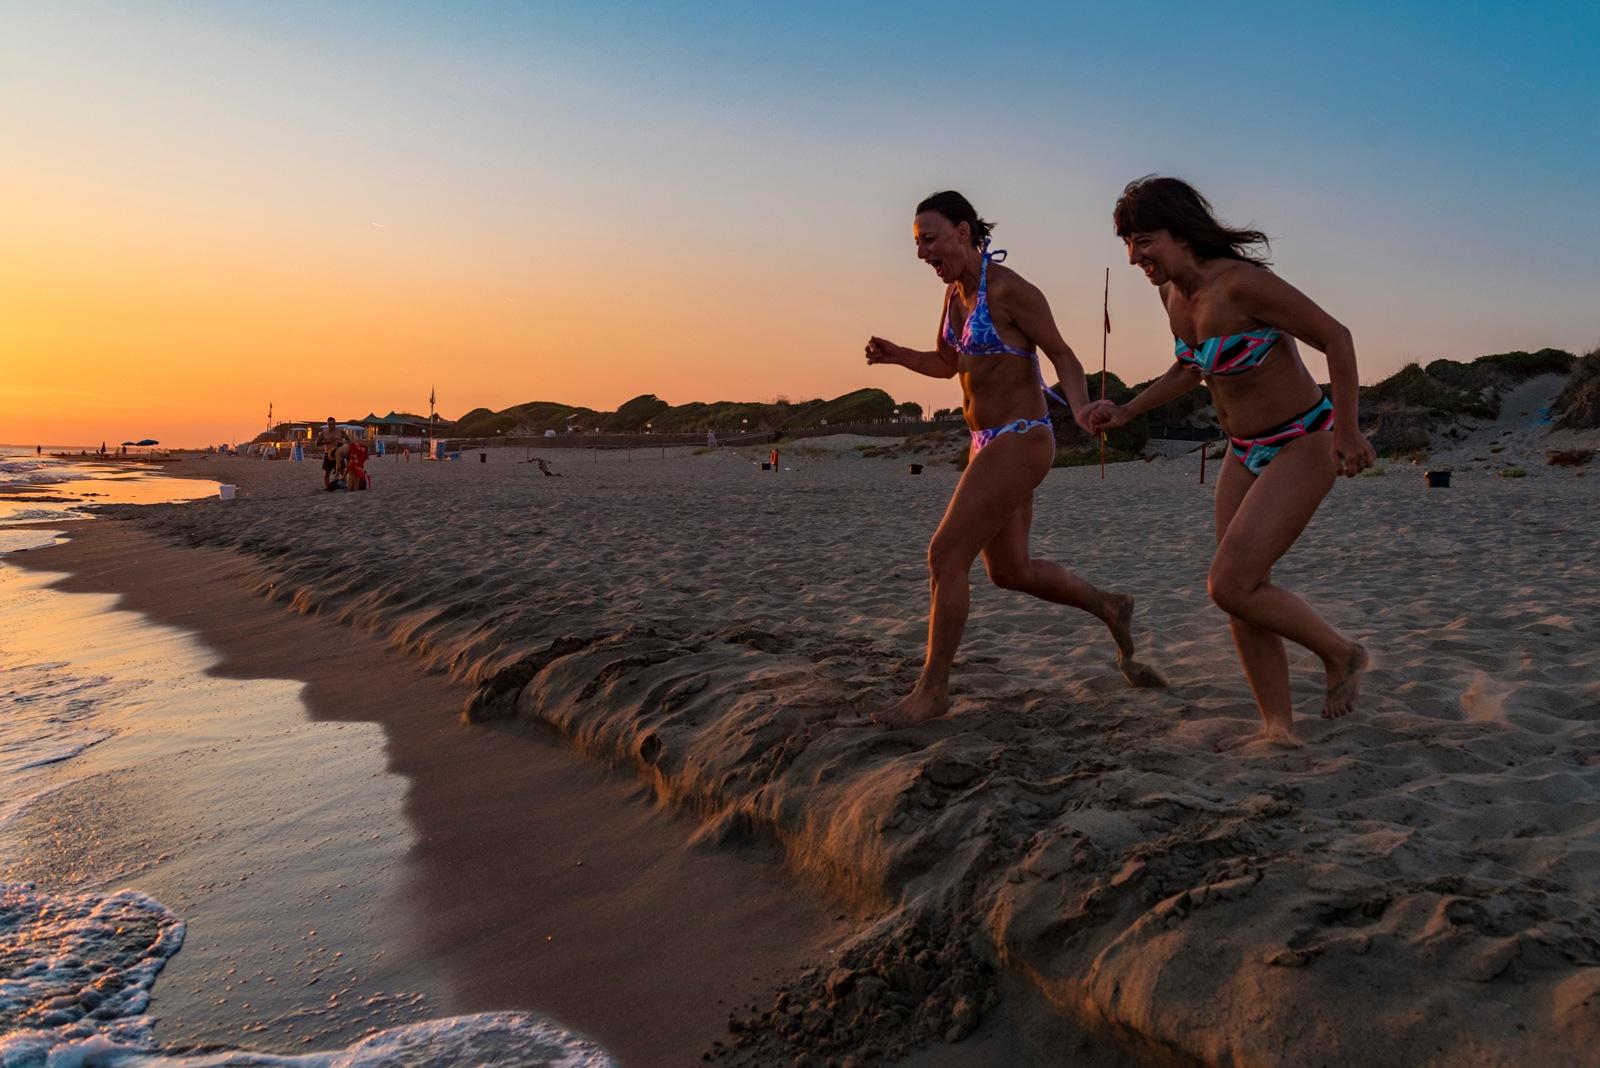 Running into the sea 1/2 by Roberto Scordino